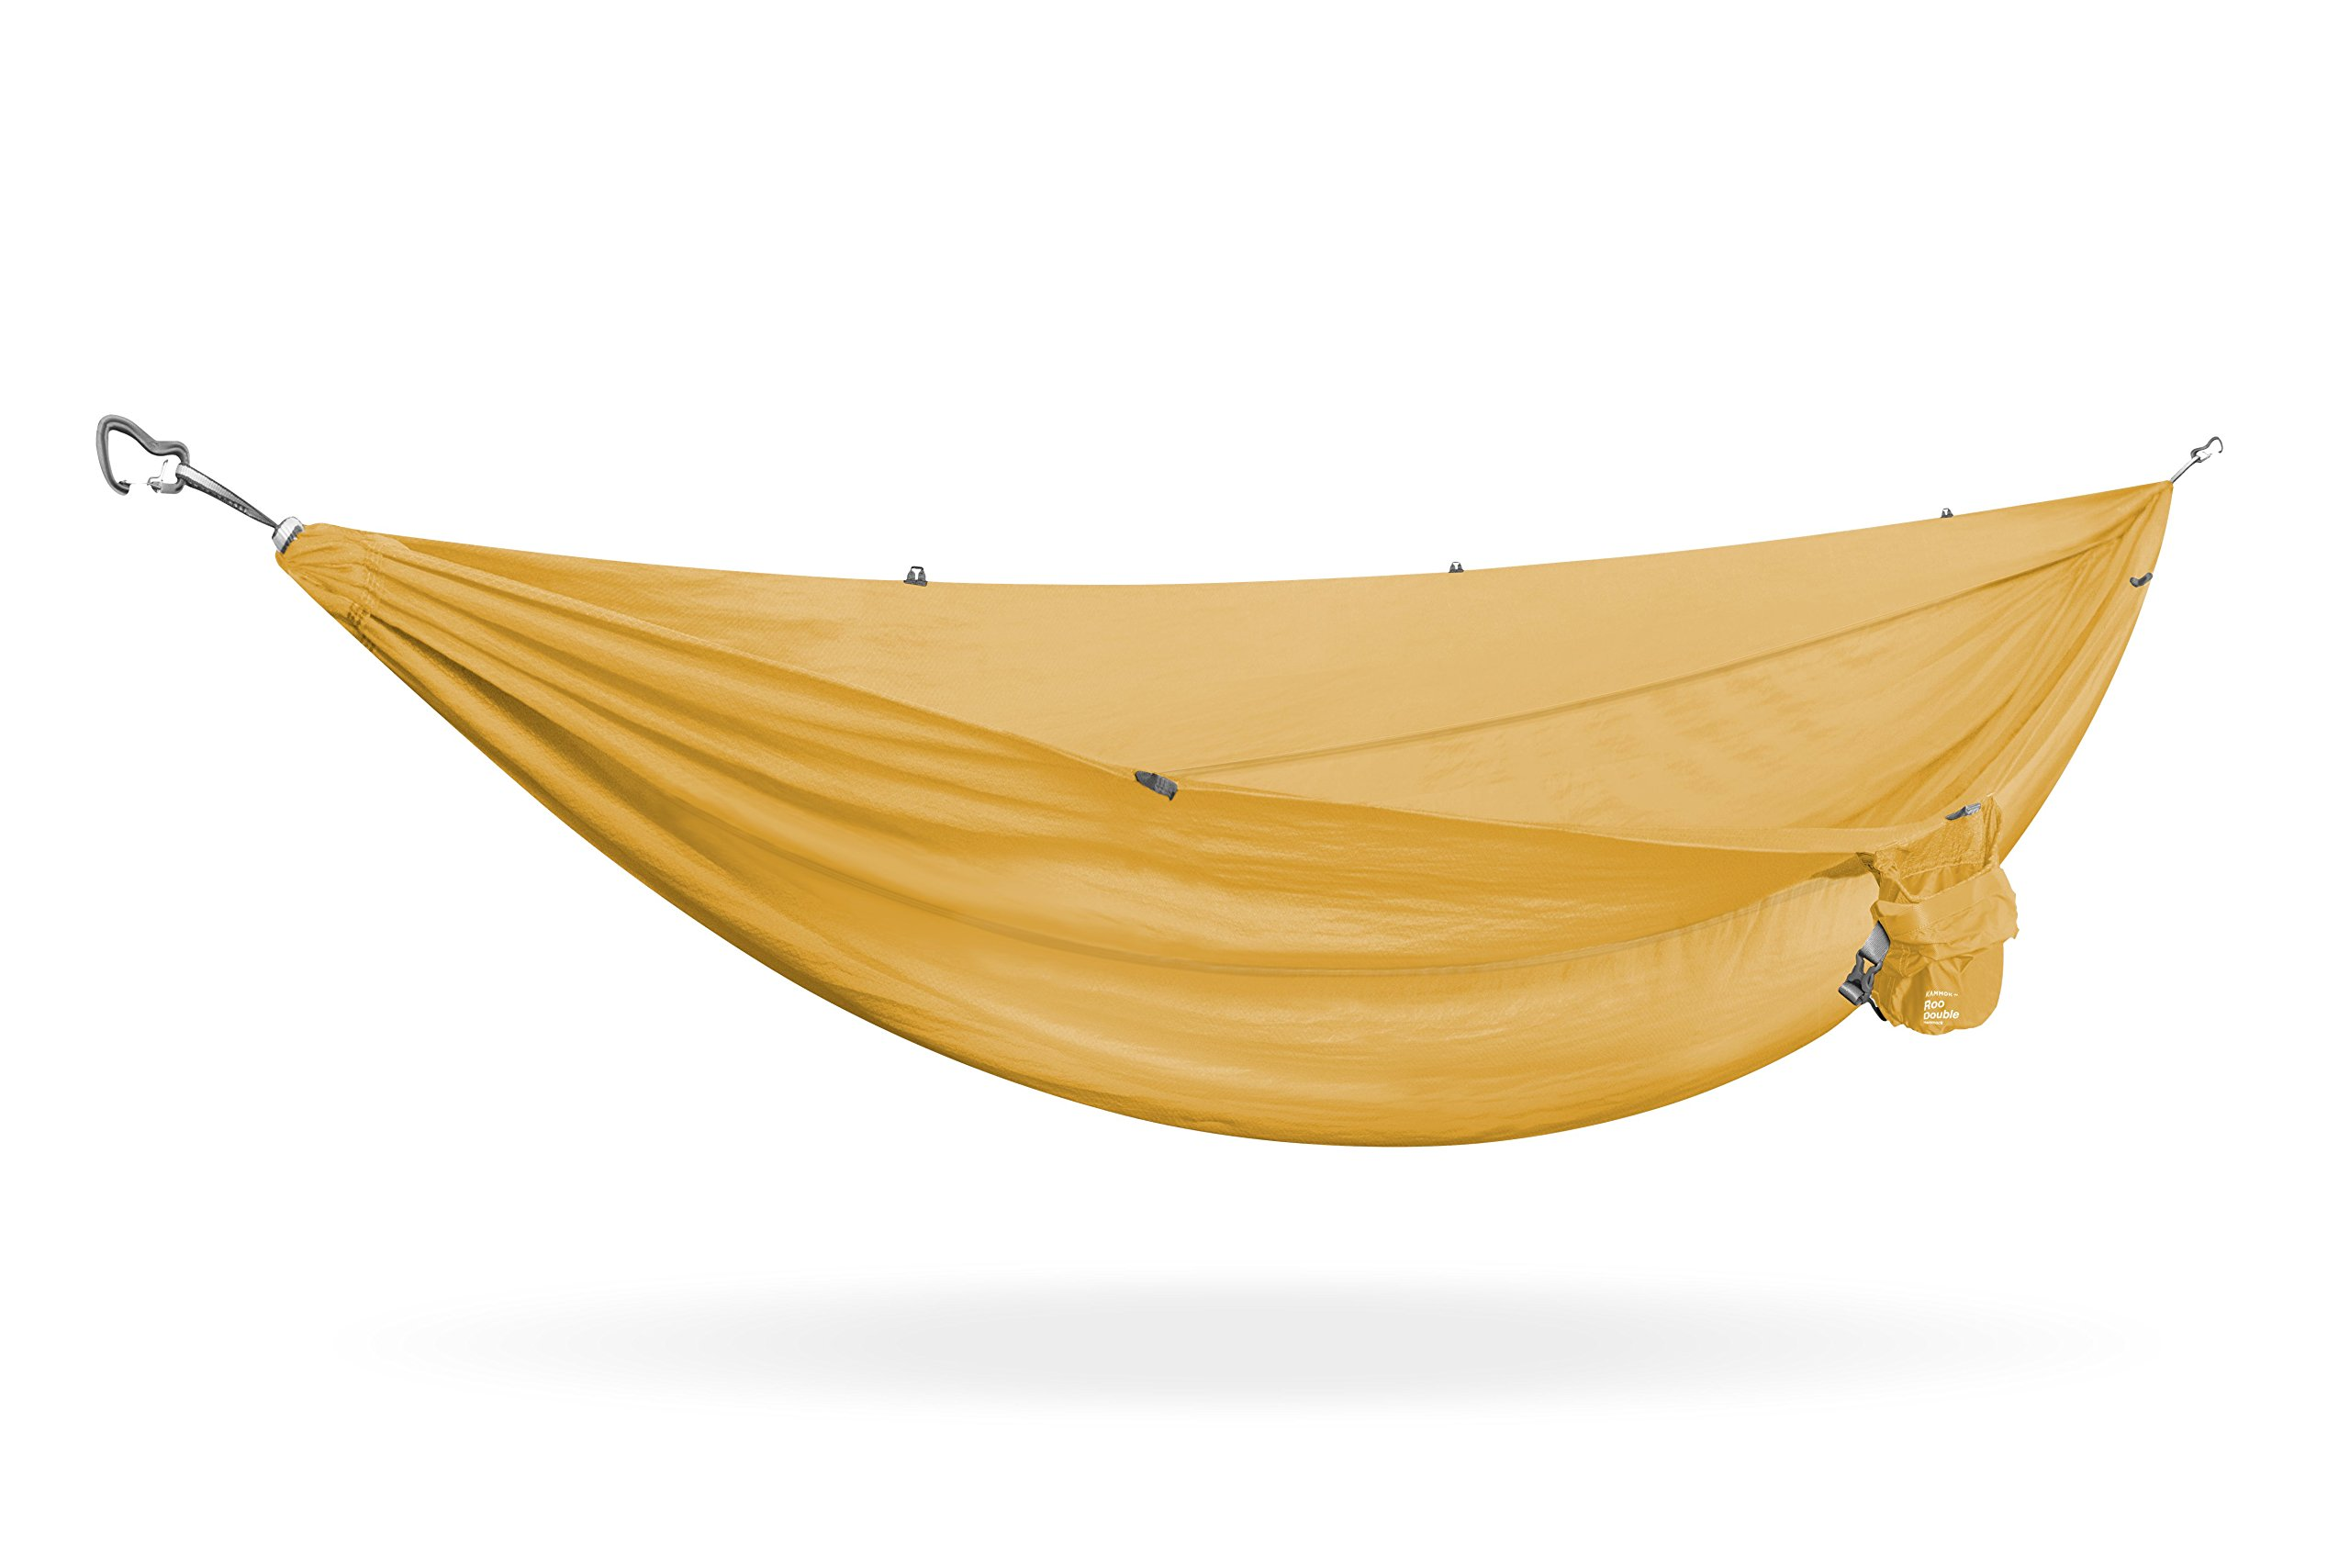 KAMMOK Roo Double Camping Hammock - Sunflower Gold by KAMMOK